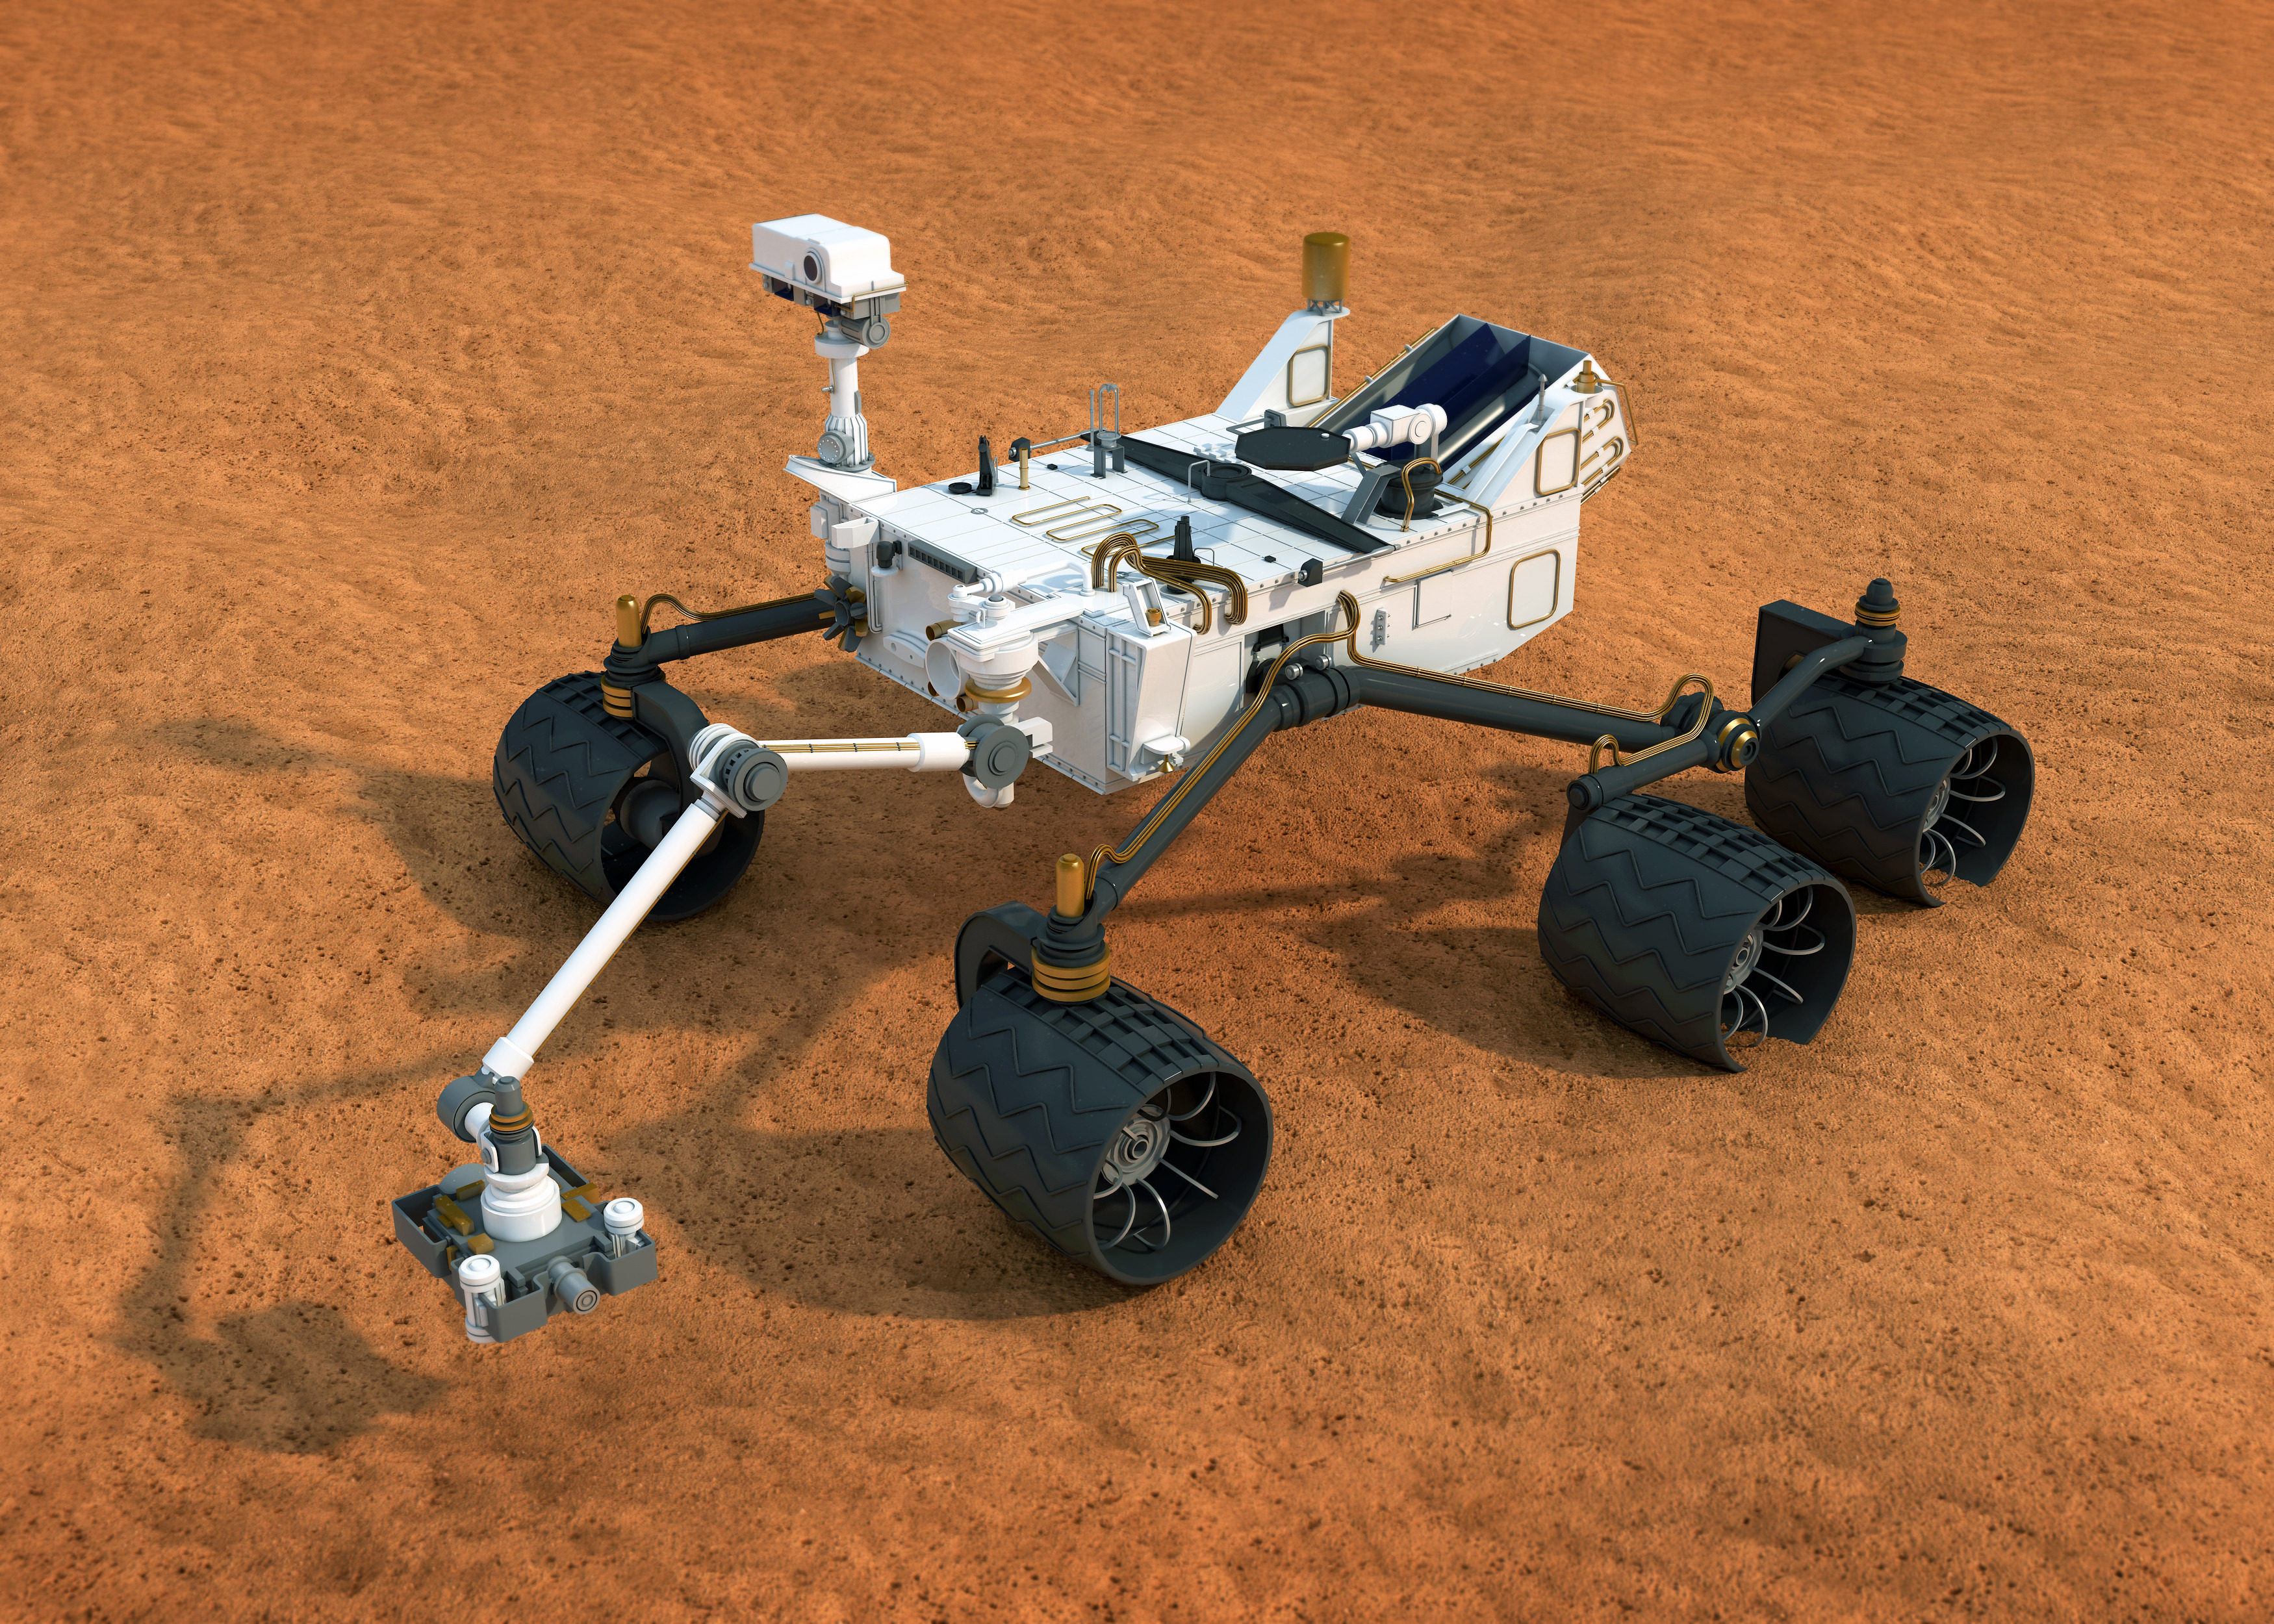 Ils 6 d'avust 2012 è il Curiosity Rover da la Nasa sa platgadas sin il Mars.